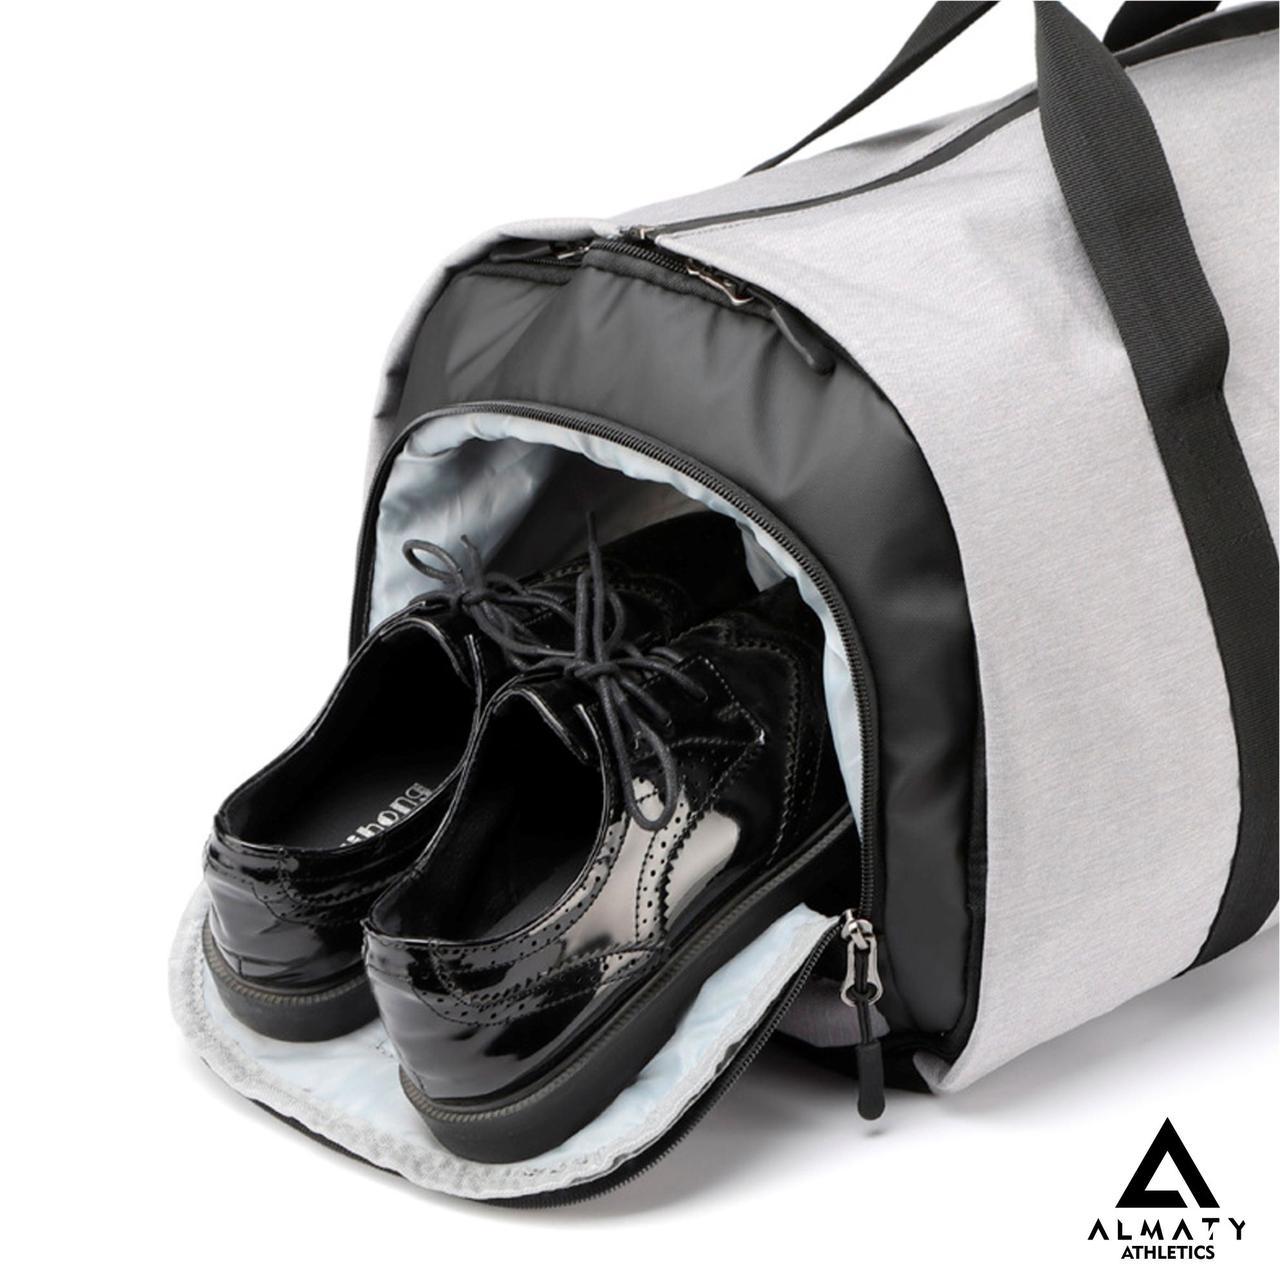 Дорожная сумка-портплед ALMATY ATHLETICS - фото 3